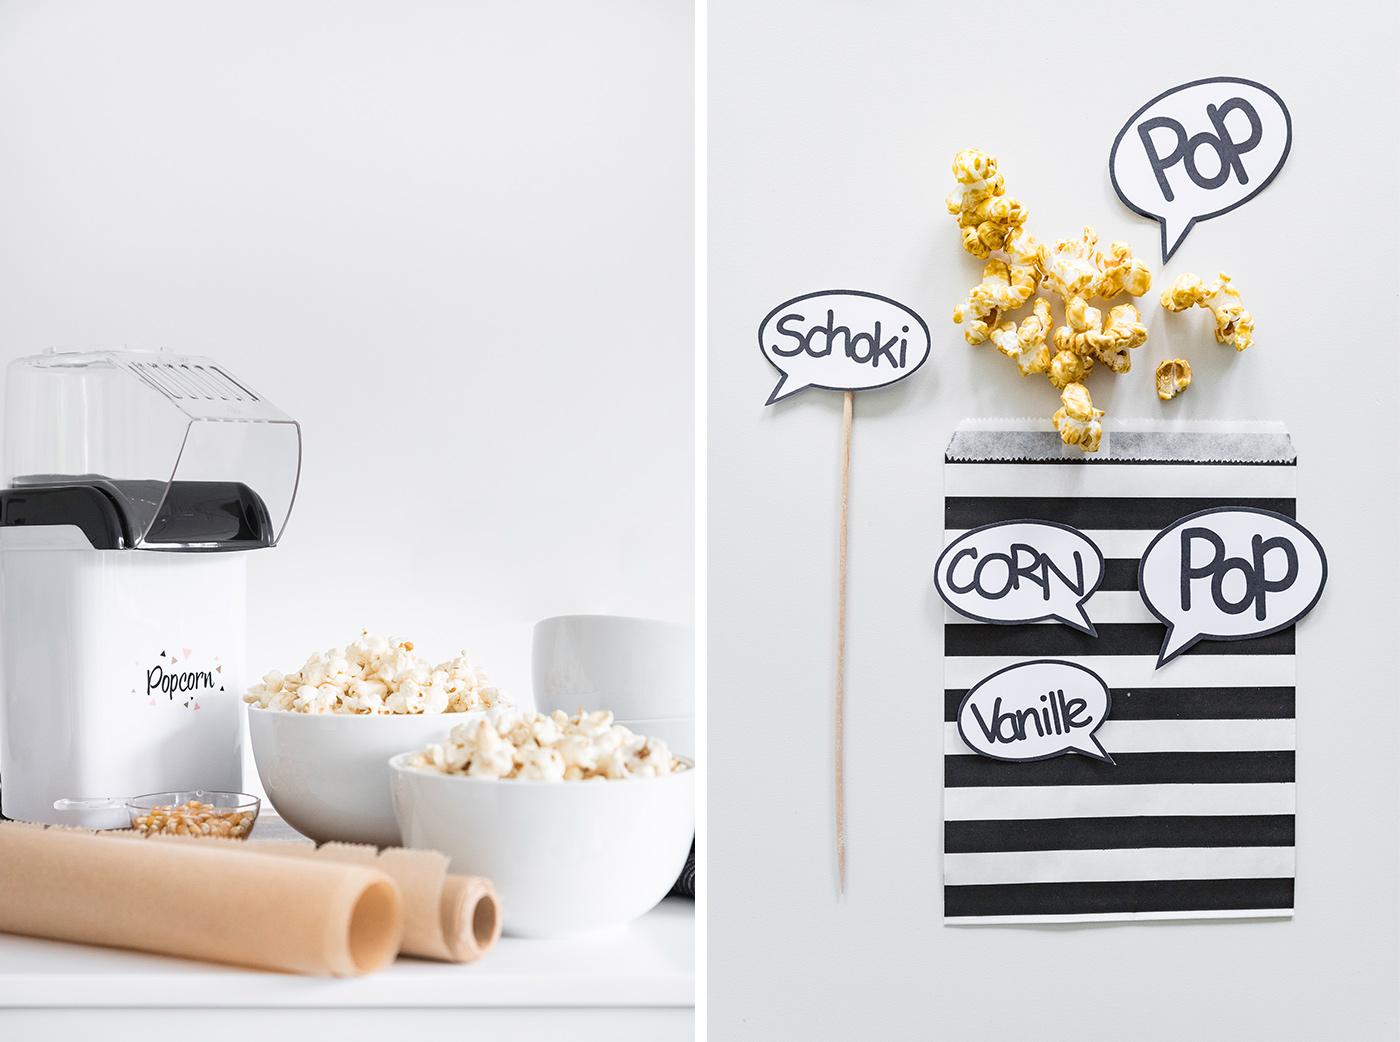 Popcorn aus der Popcornmachine - Popcornrezepte